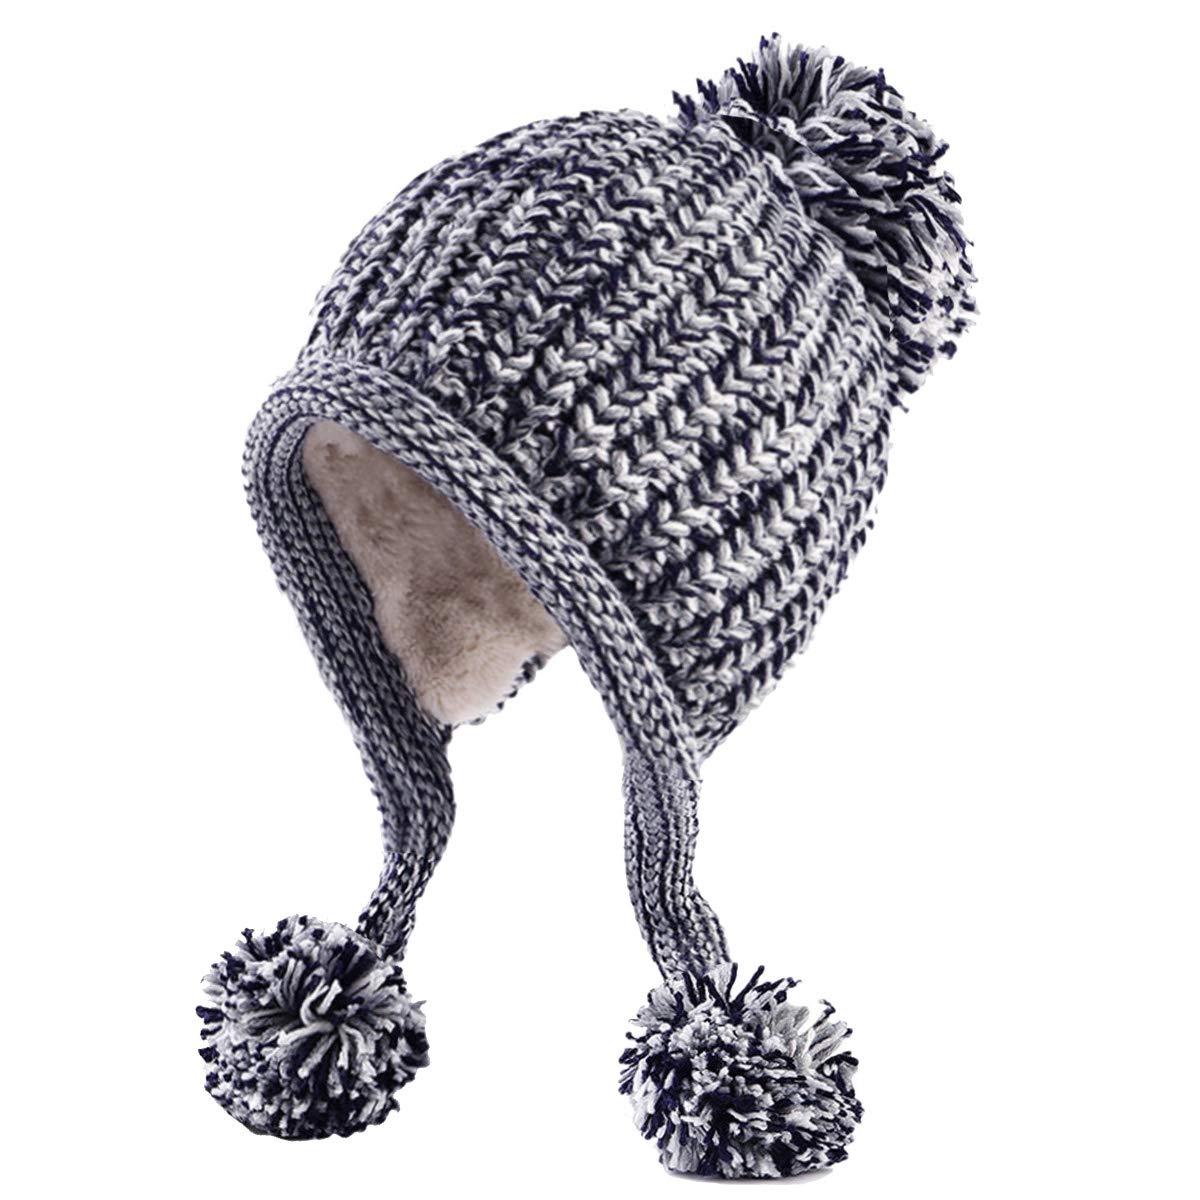 ea5c72ab16f6c HUAMULAN Women Winter Thick Beanie Hat Ski Ear Flaps Caps Dual Layered  Fleece Lined Pompoms - Gray -  Amazon.co.uk  Clothing